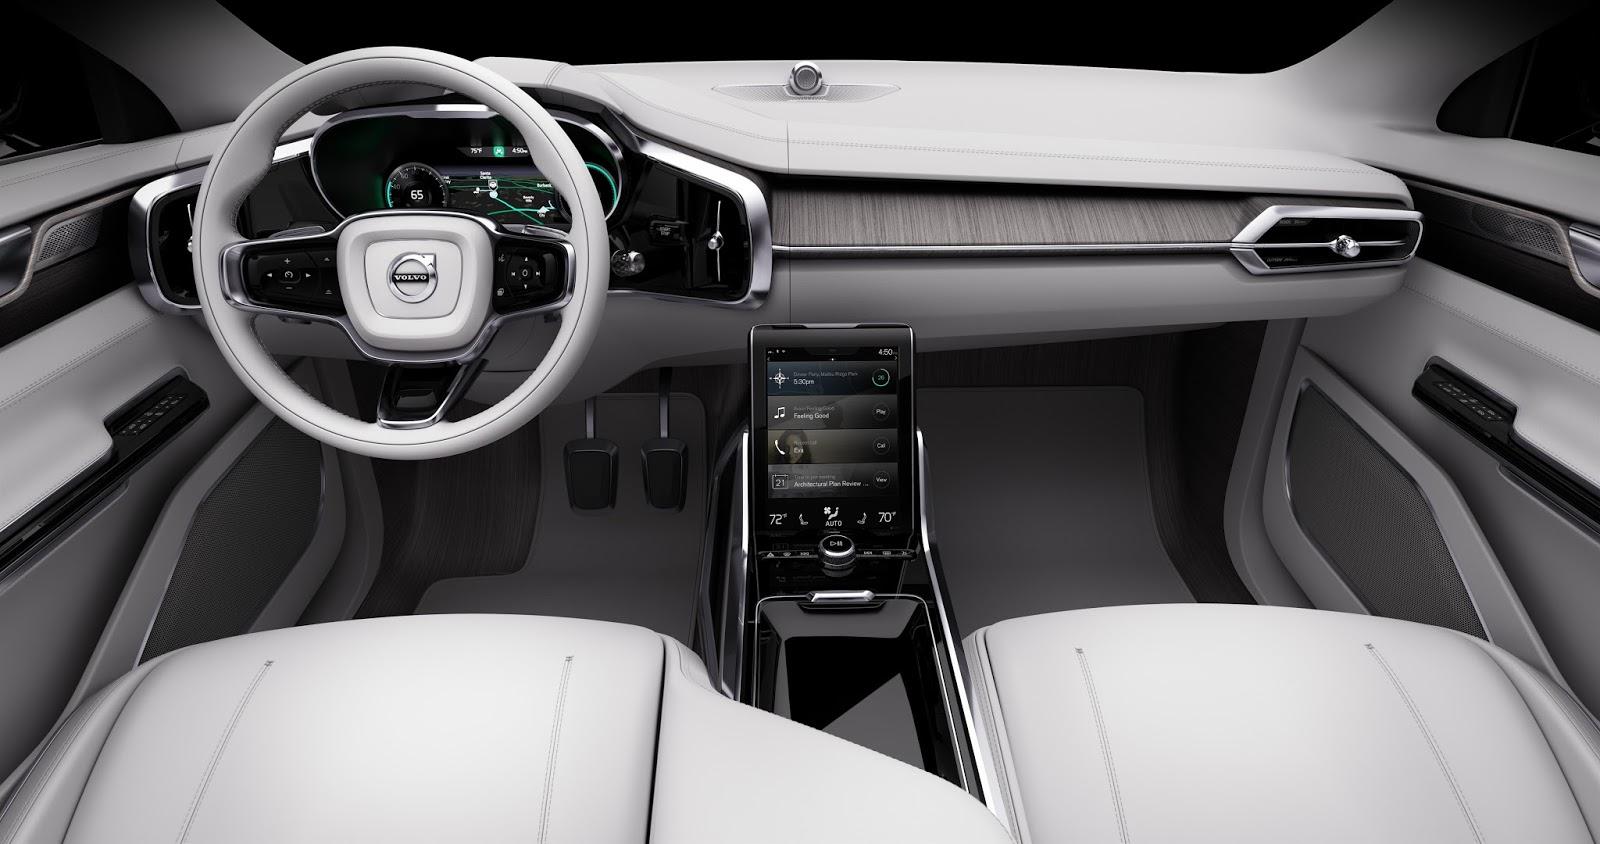 169538 Concept 26 Η Volvo θα κάνει και την αυτόνομη οδήγηση διασκεδαστική Autonomous Driving, Volvo, Volvo XC90, Αυτόνομη οδήγηση